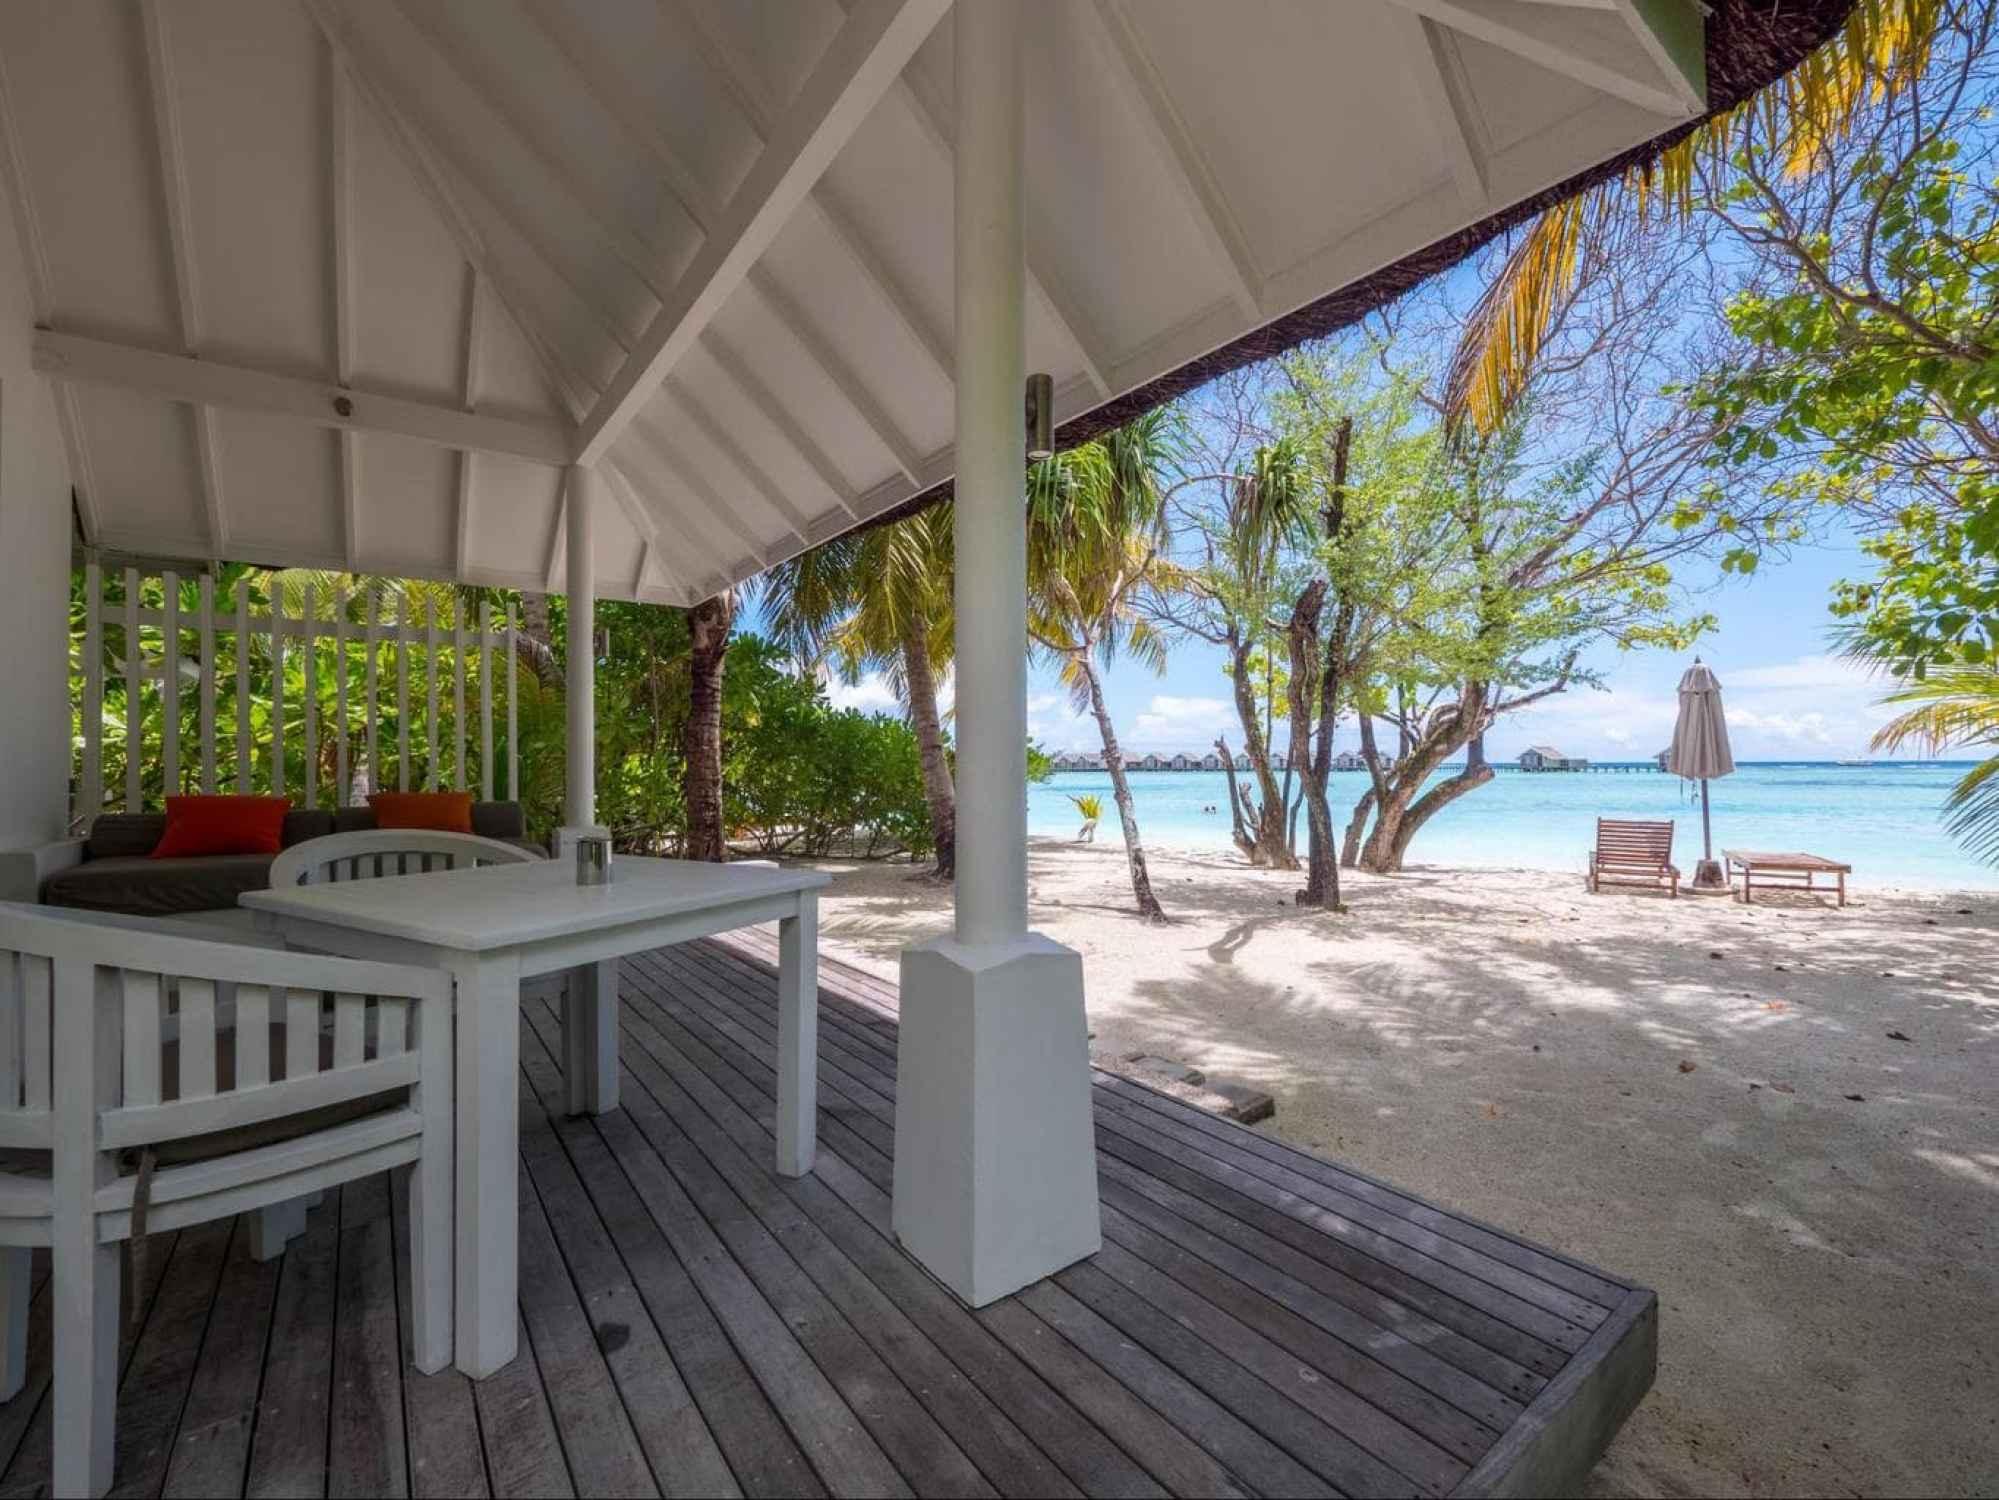 Outdoor areas of the Beach villas